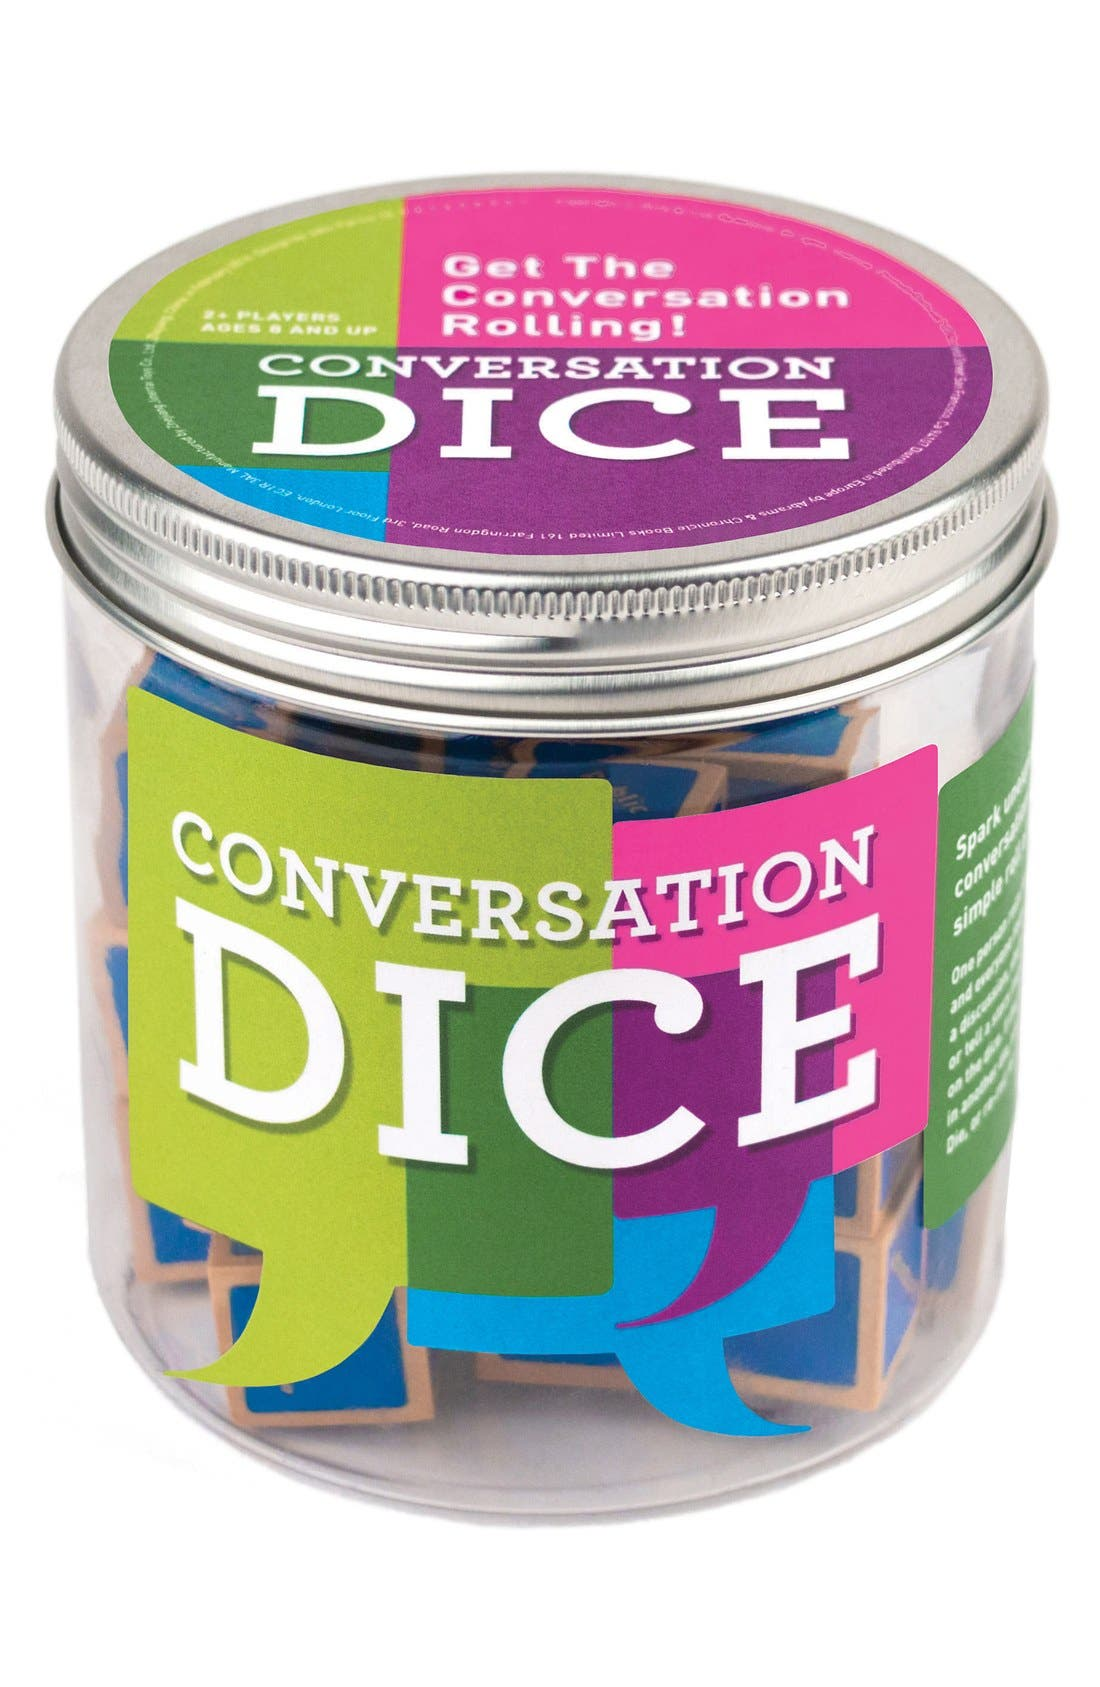 Conversation Dice,                         Main,                         color, 300